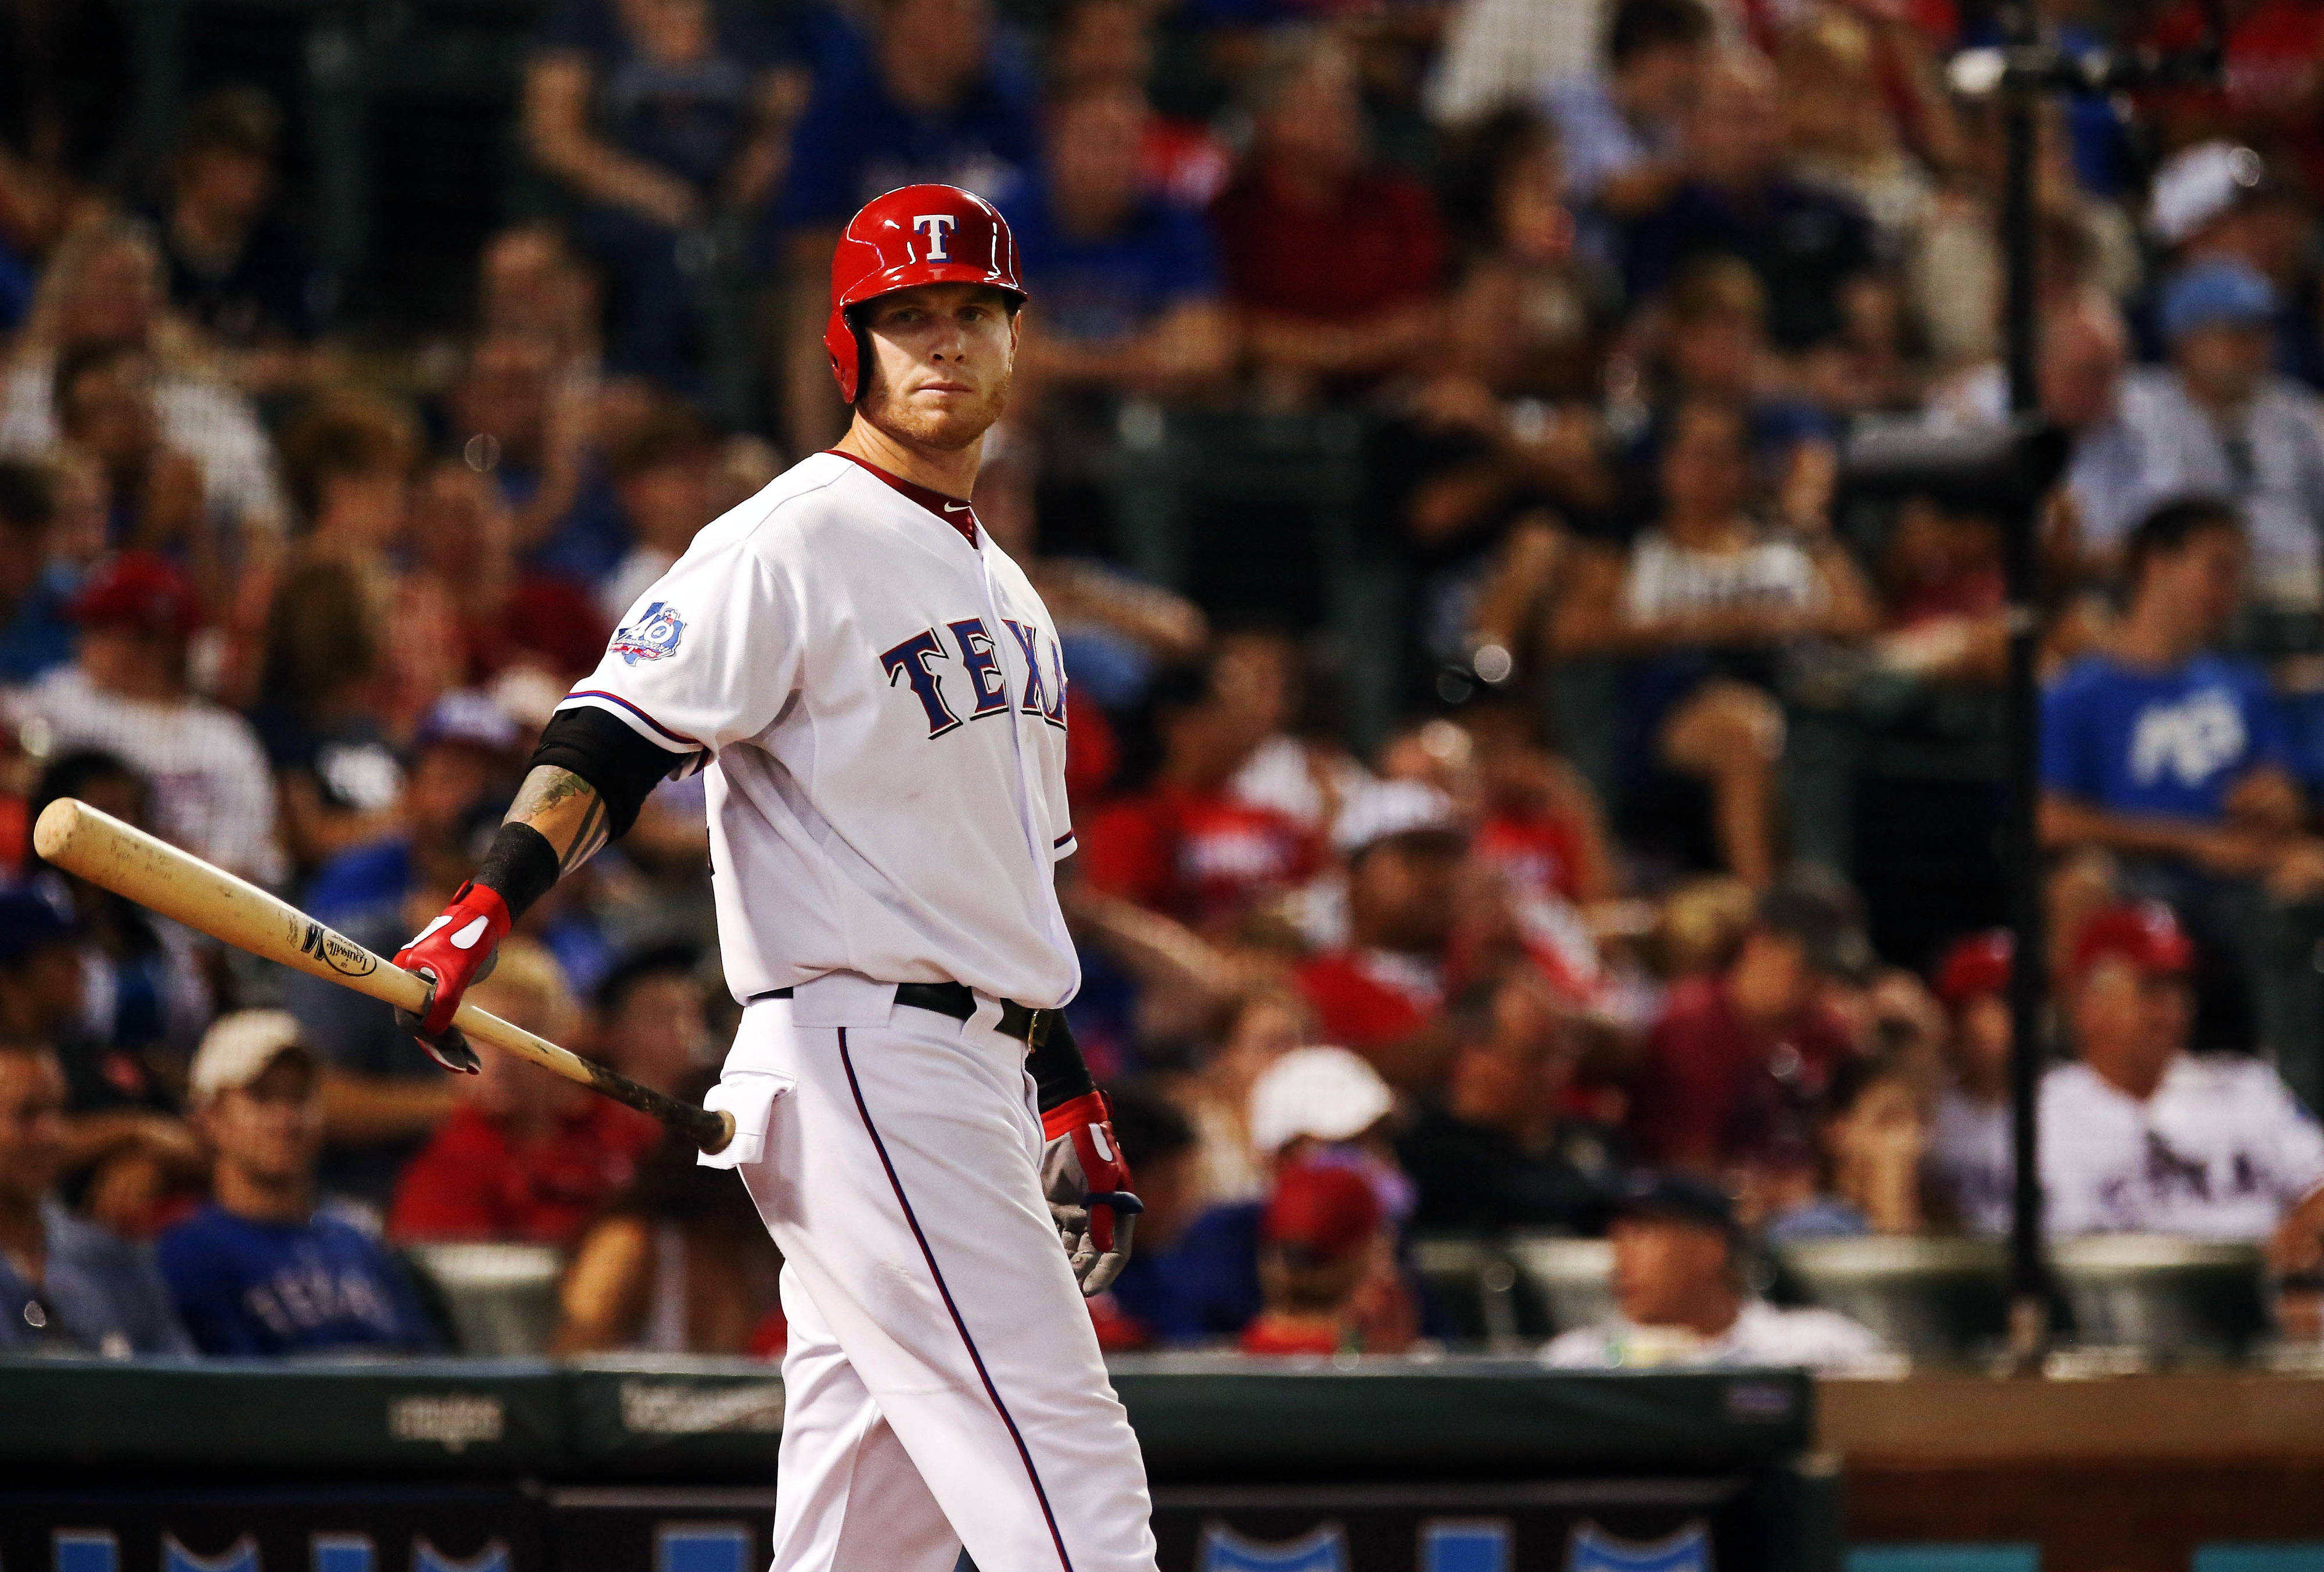 Arlington, TX, USA; Texas Rangers left fielder Josh Hamilton twirls his bat in the on deck circle during a game at Rangers Ballpark. Credit: Kevin Jairaj-US PRESSWIRE